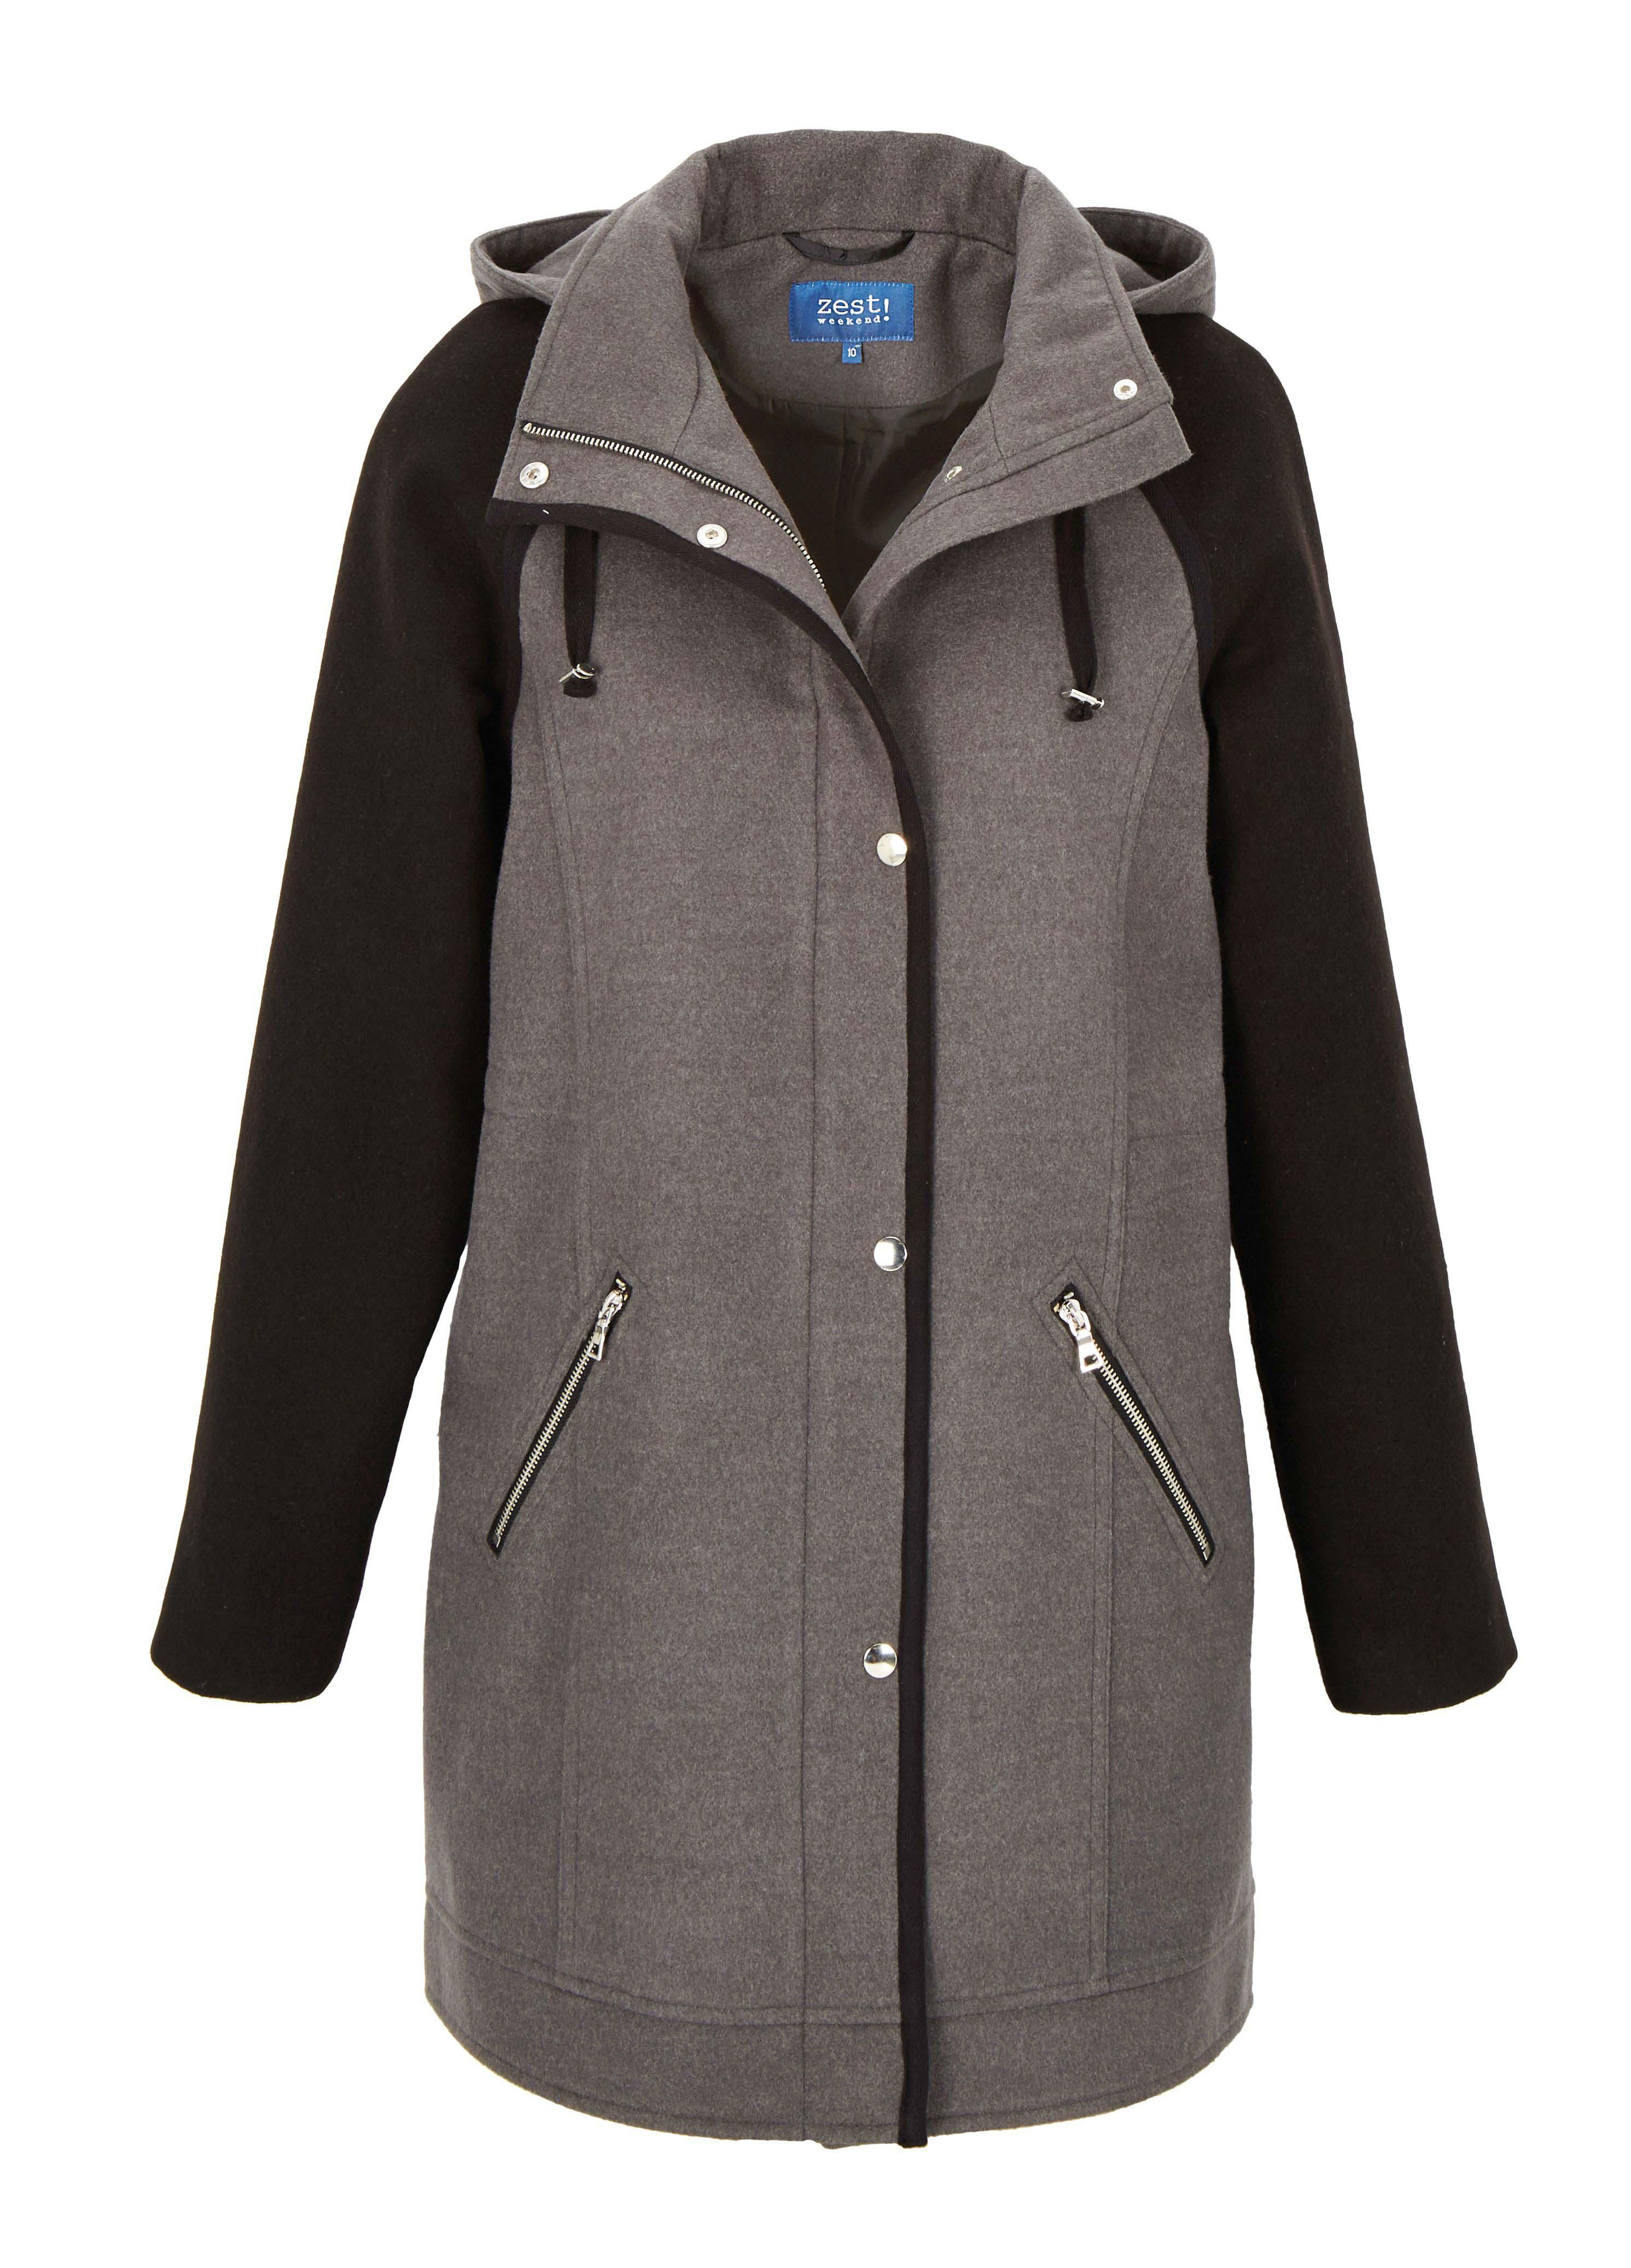 6090156 Zest Hooded Coat $149.99 Instore March 09 2016